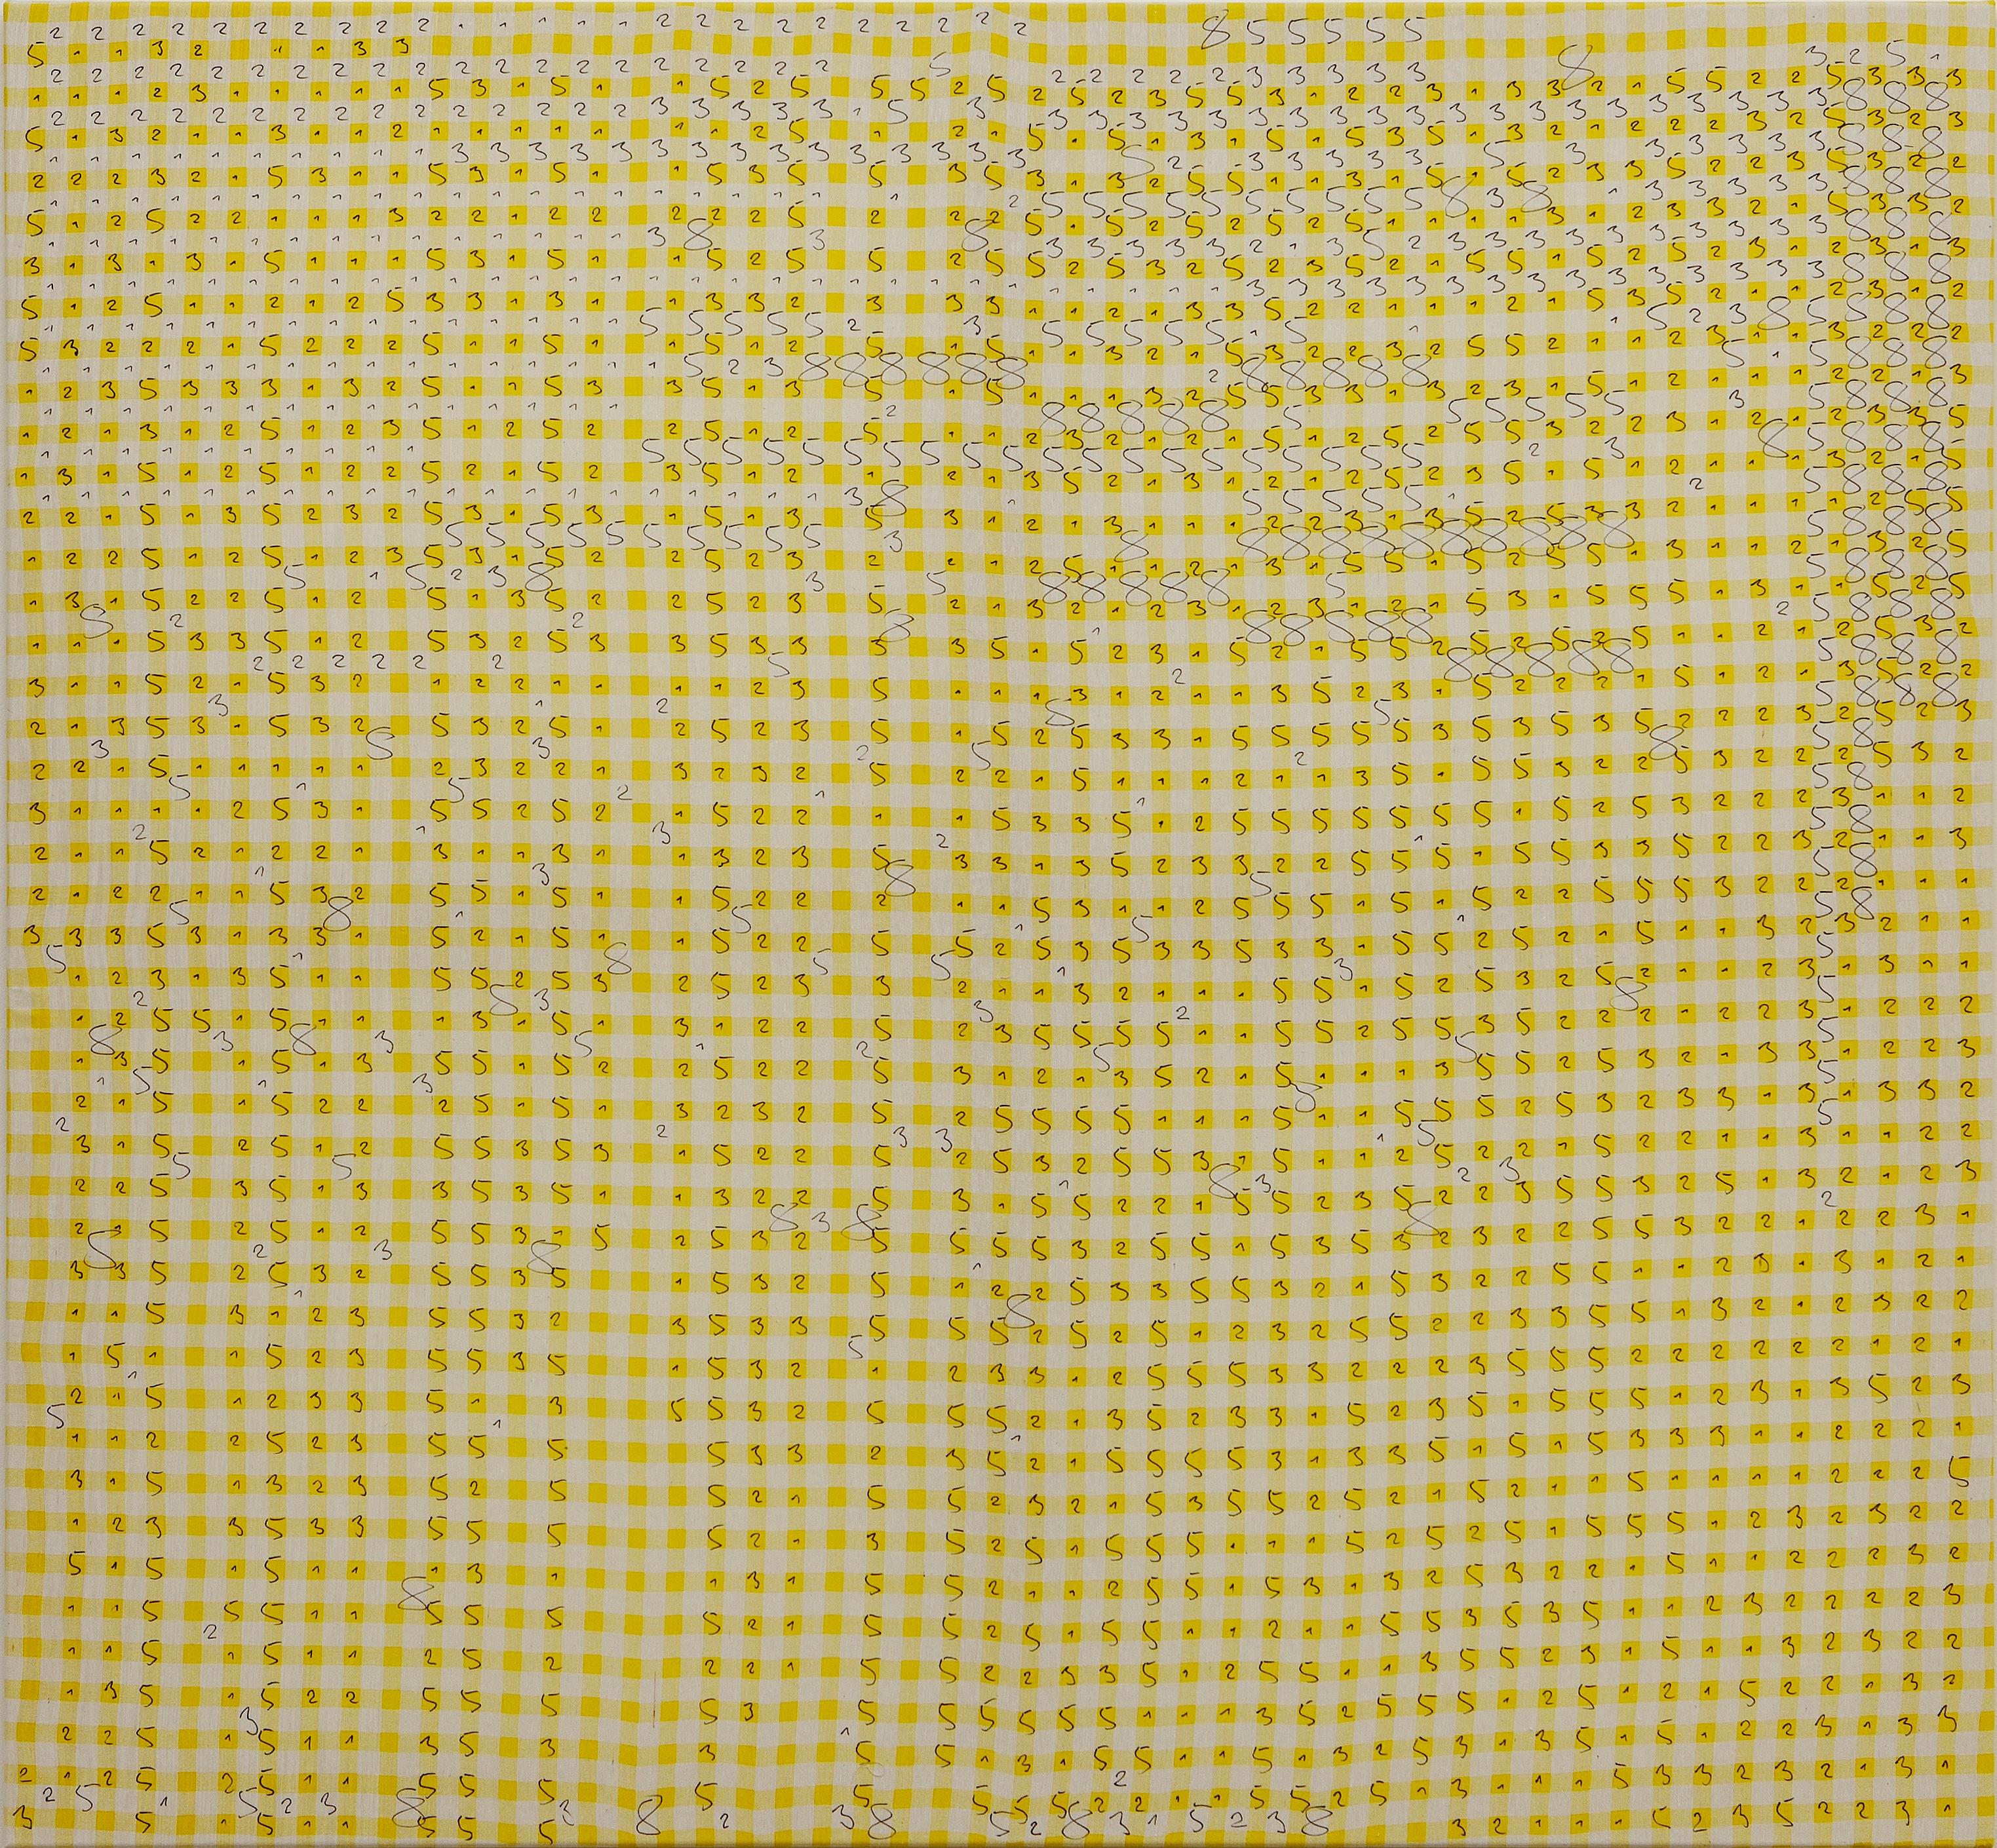 Patapum...! Patapum...! Patapum...! Oleksiy Koval, 2015 130 x 140 cm, marker on cotton Photo © Klaus Mauz